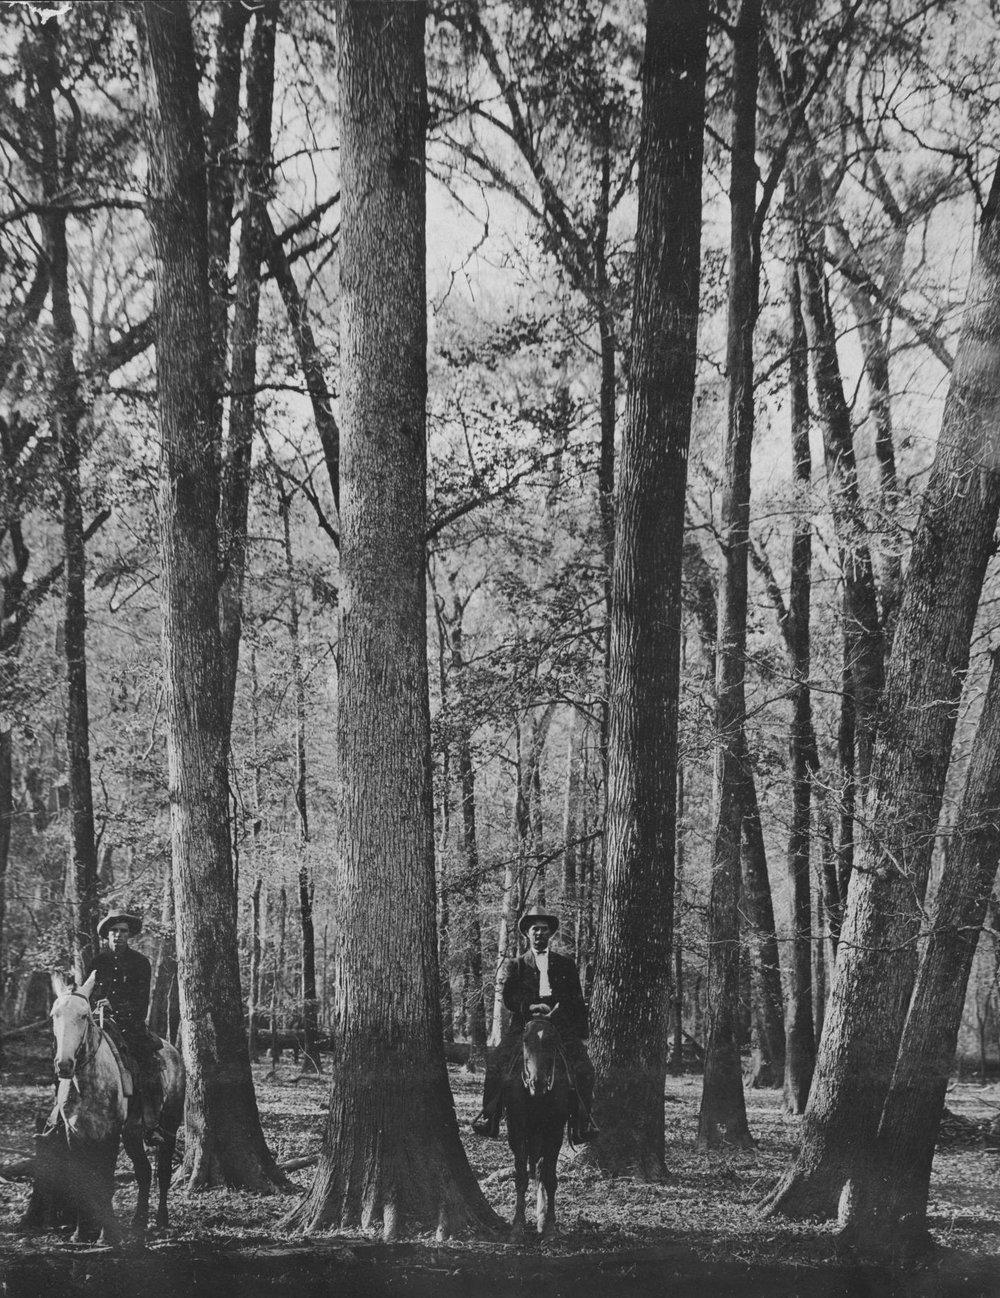 S.P. 302 white oak and gum hardwood JA Massengill